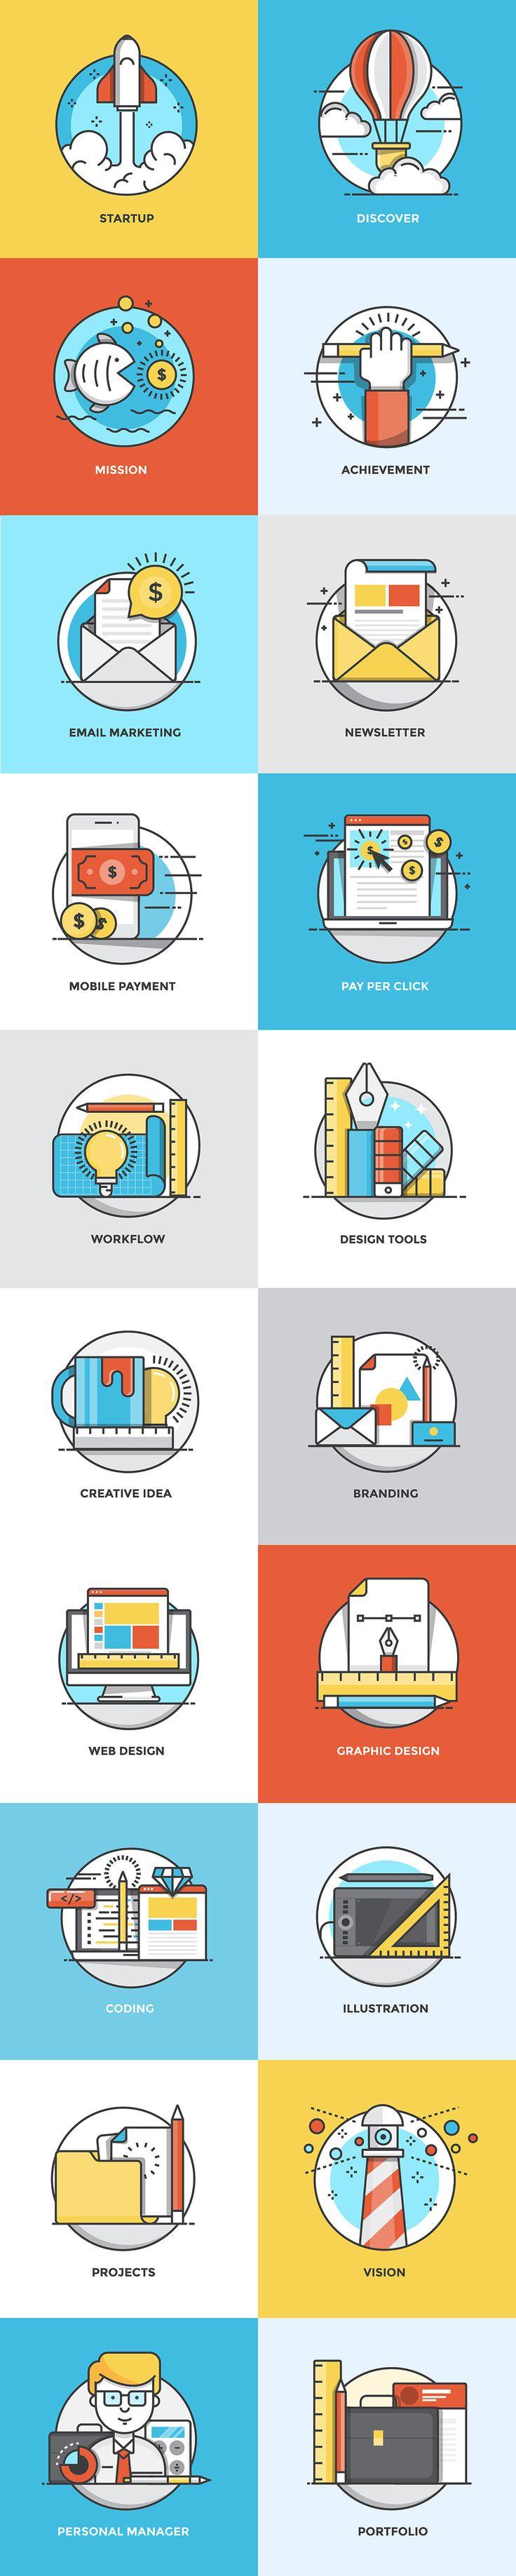 best flat illustration images on pinterest graph design